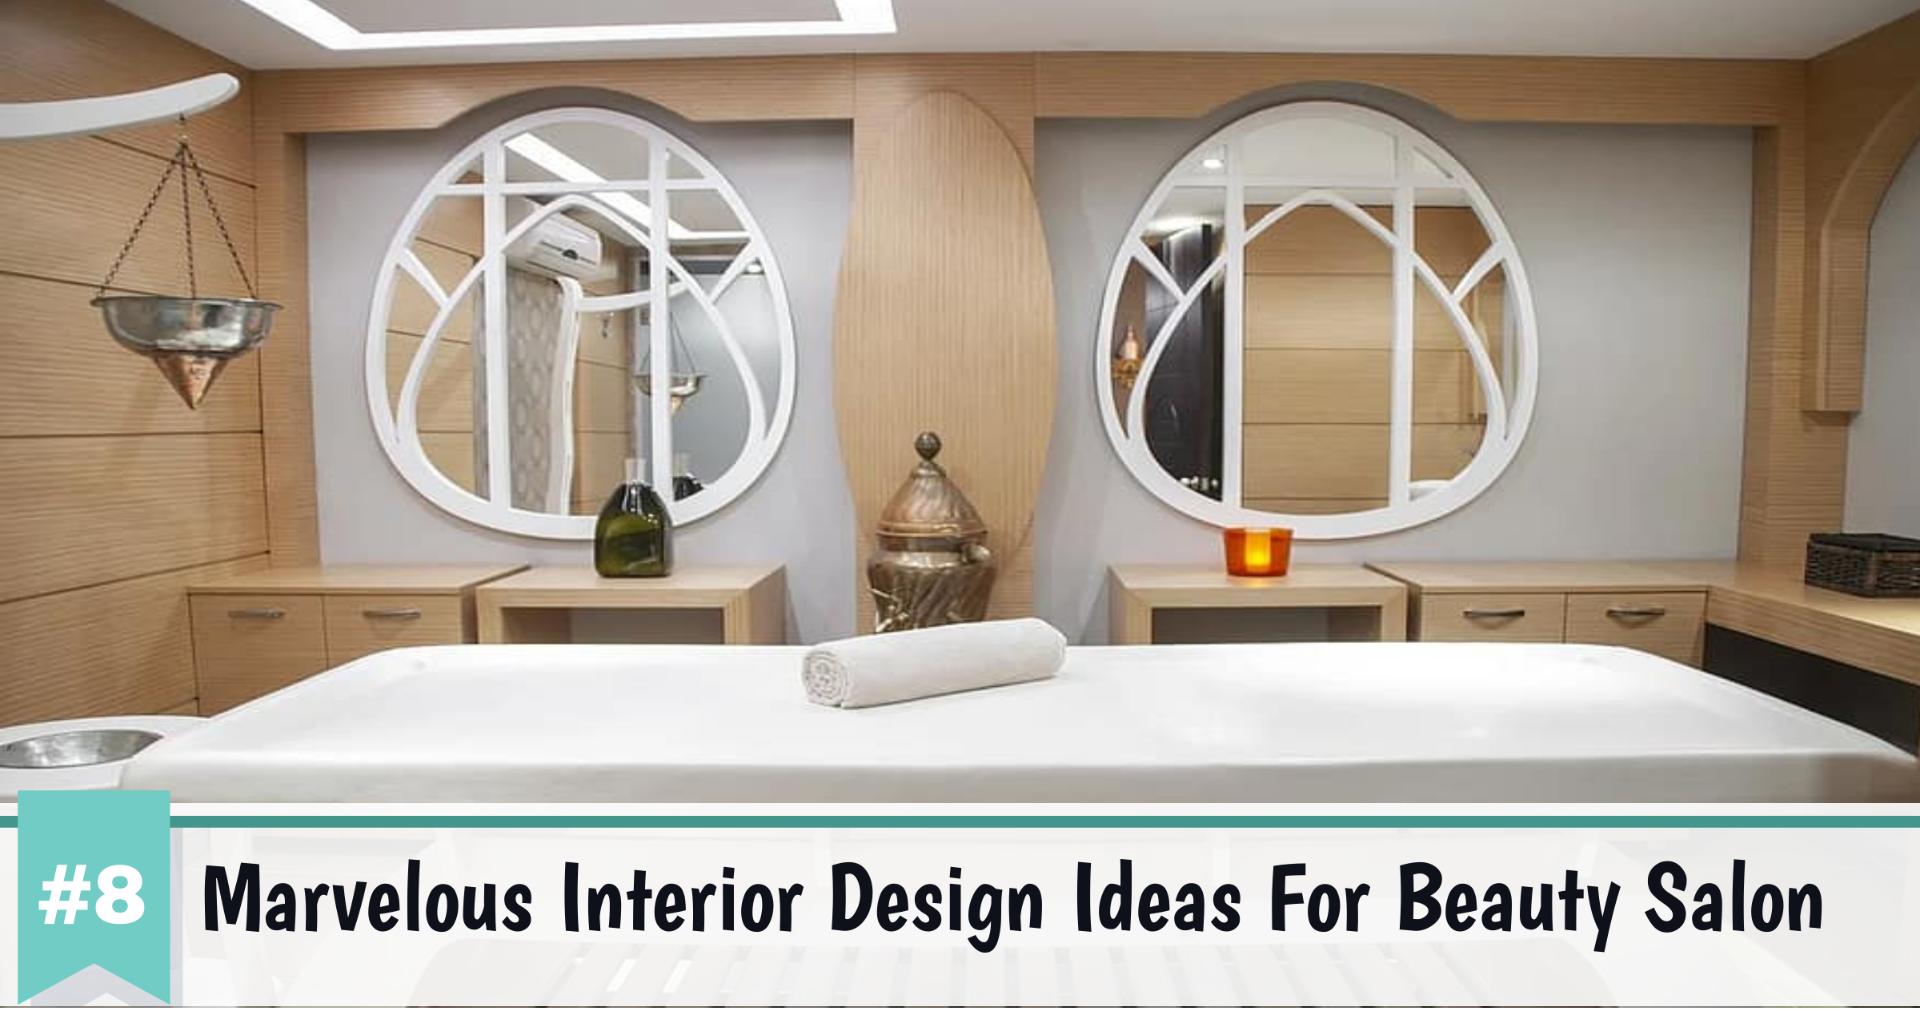 Top 8 Marvelous Interior Design Ideas For Beauty Salon